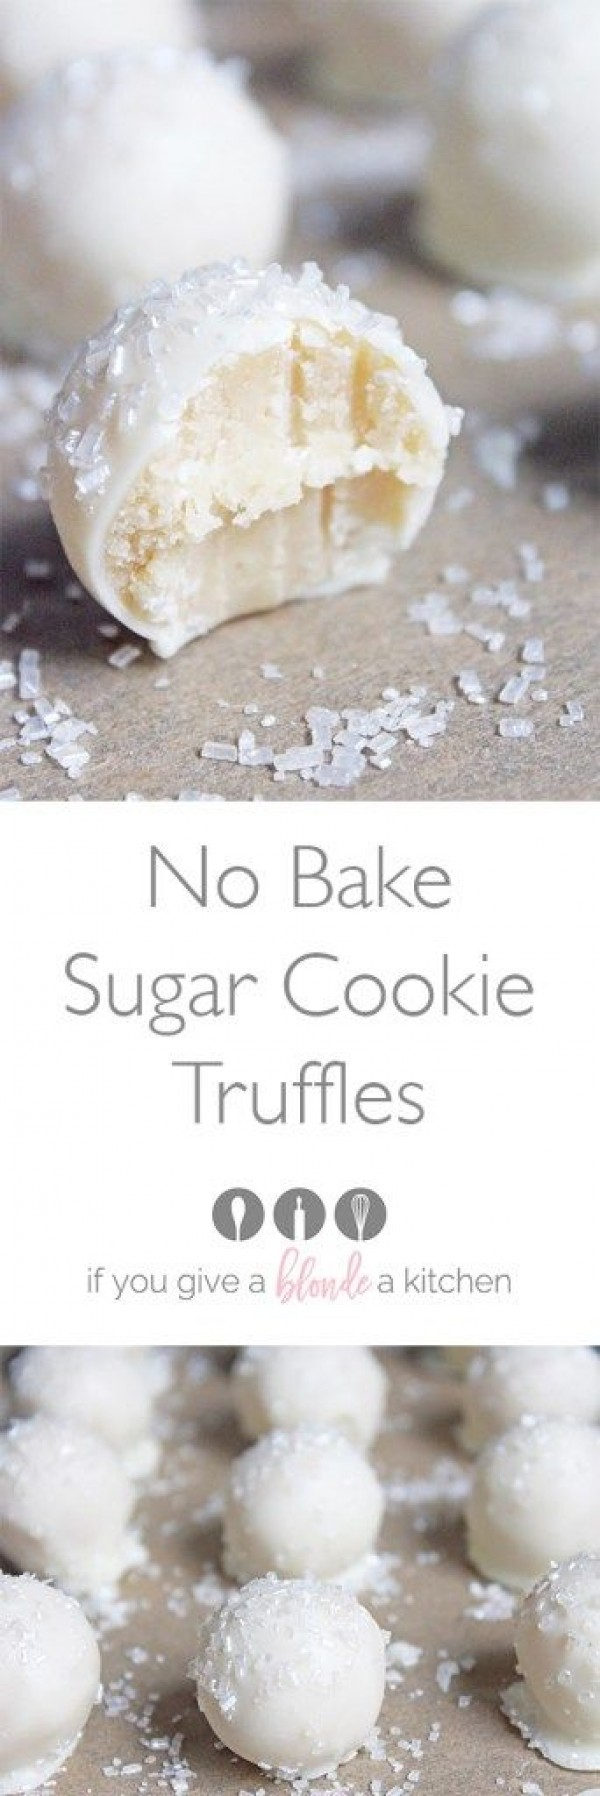 Get the recipe ♥ No Bake Sugar Cookie Truffles #besttoeat @recipes_to_go